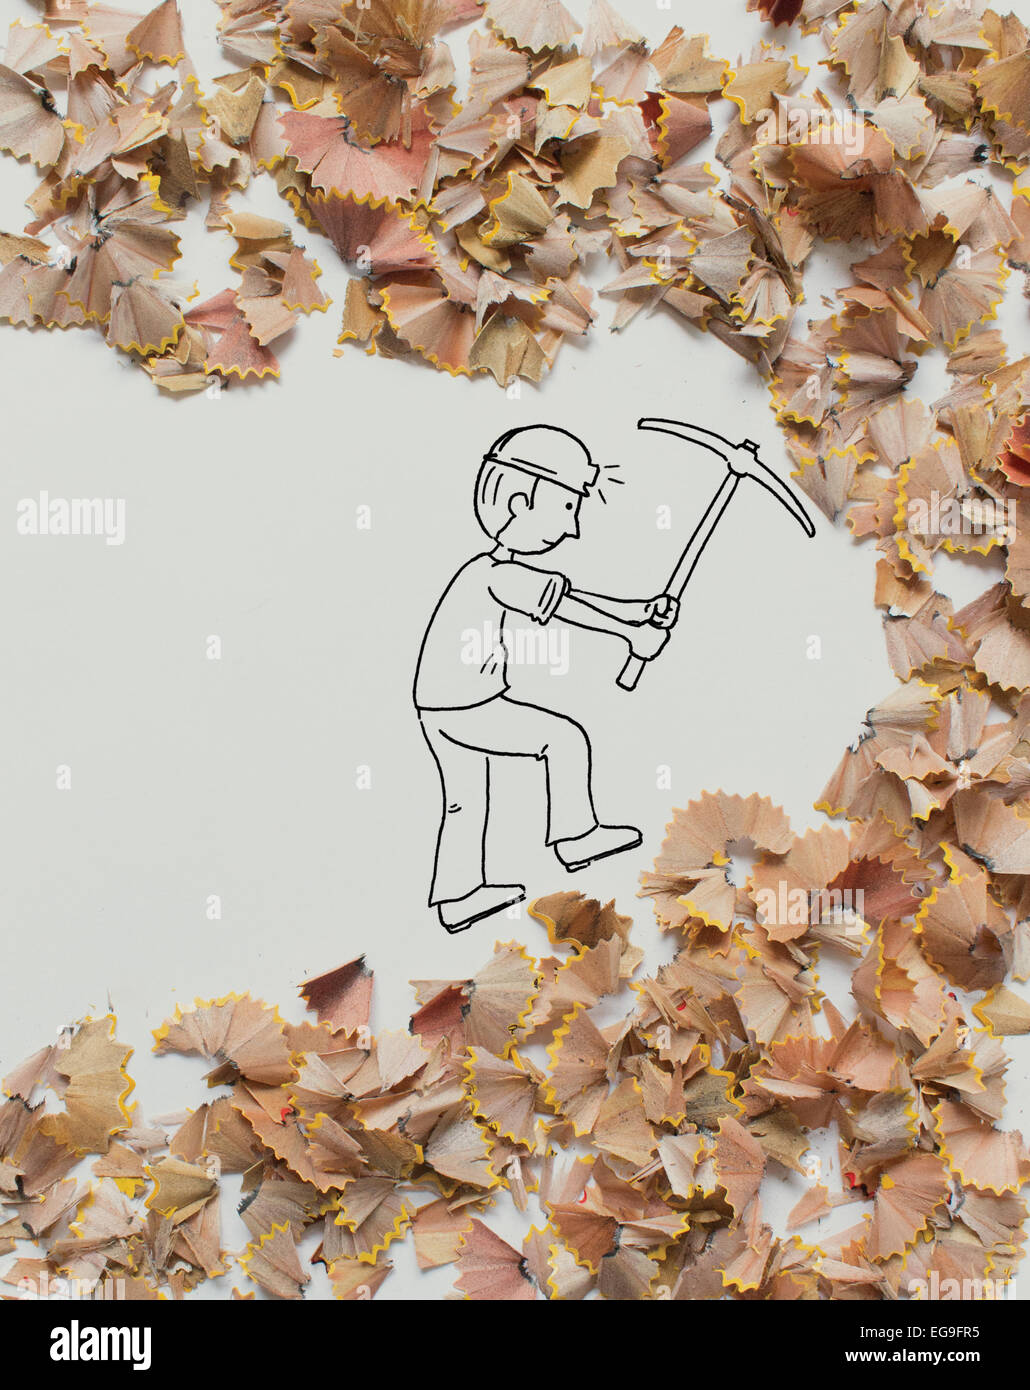 Conceptual miner digging in pencil shavings - Stock Image